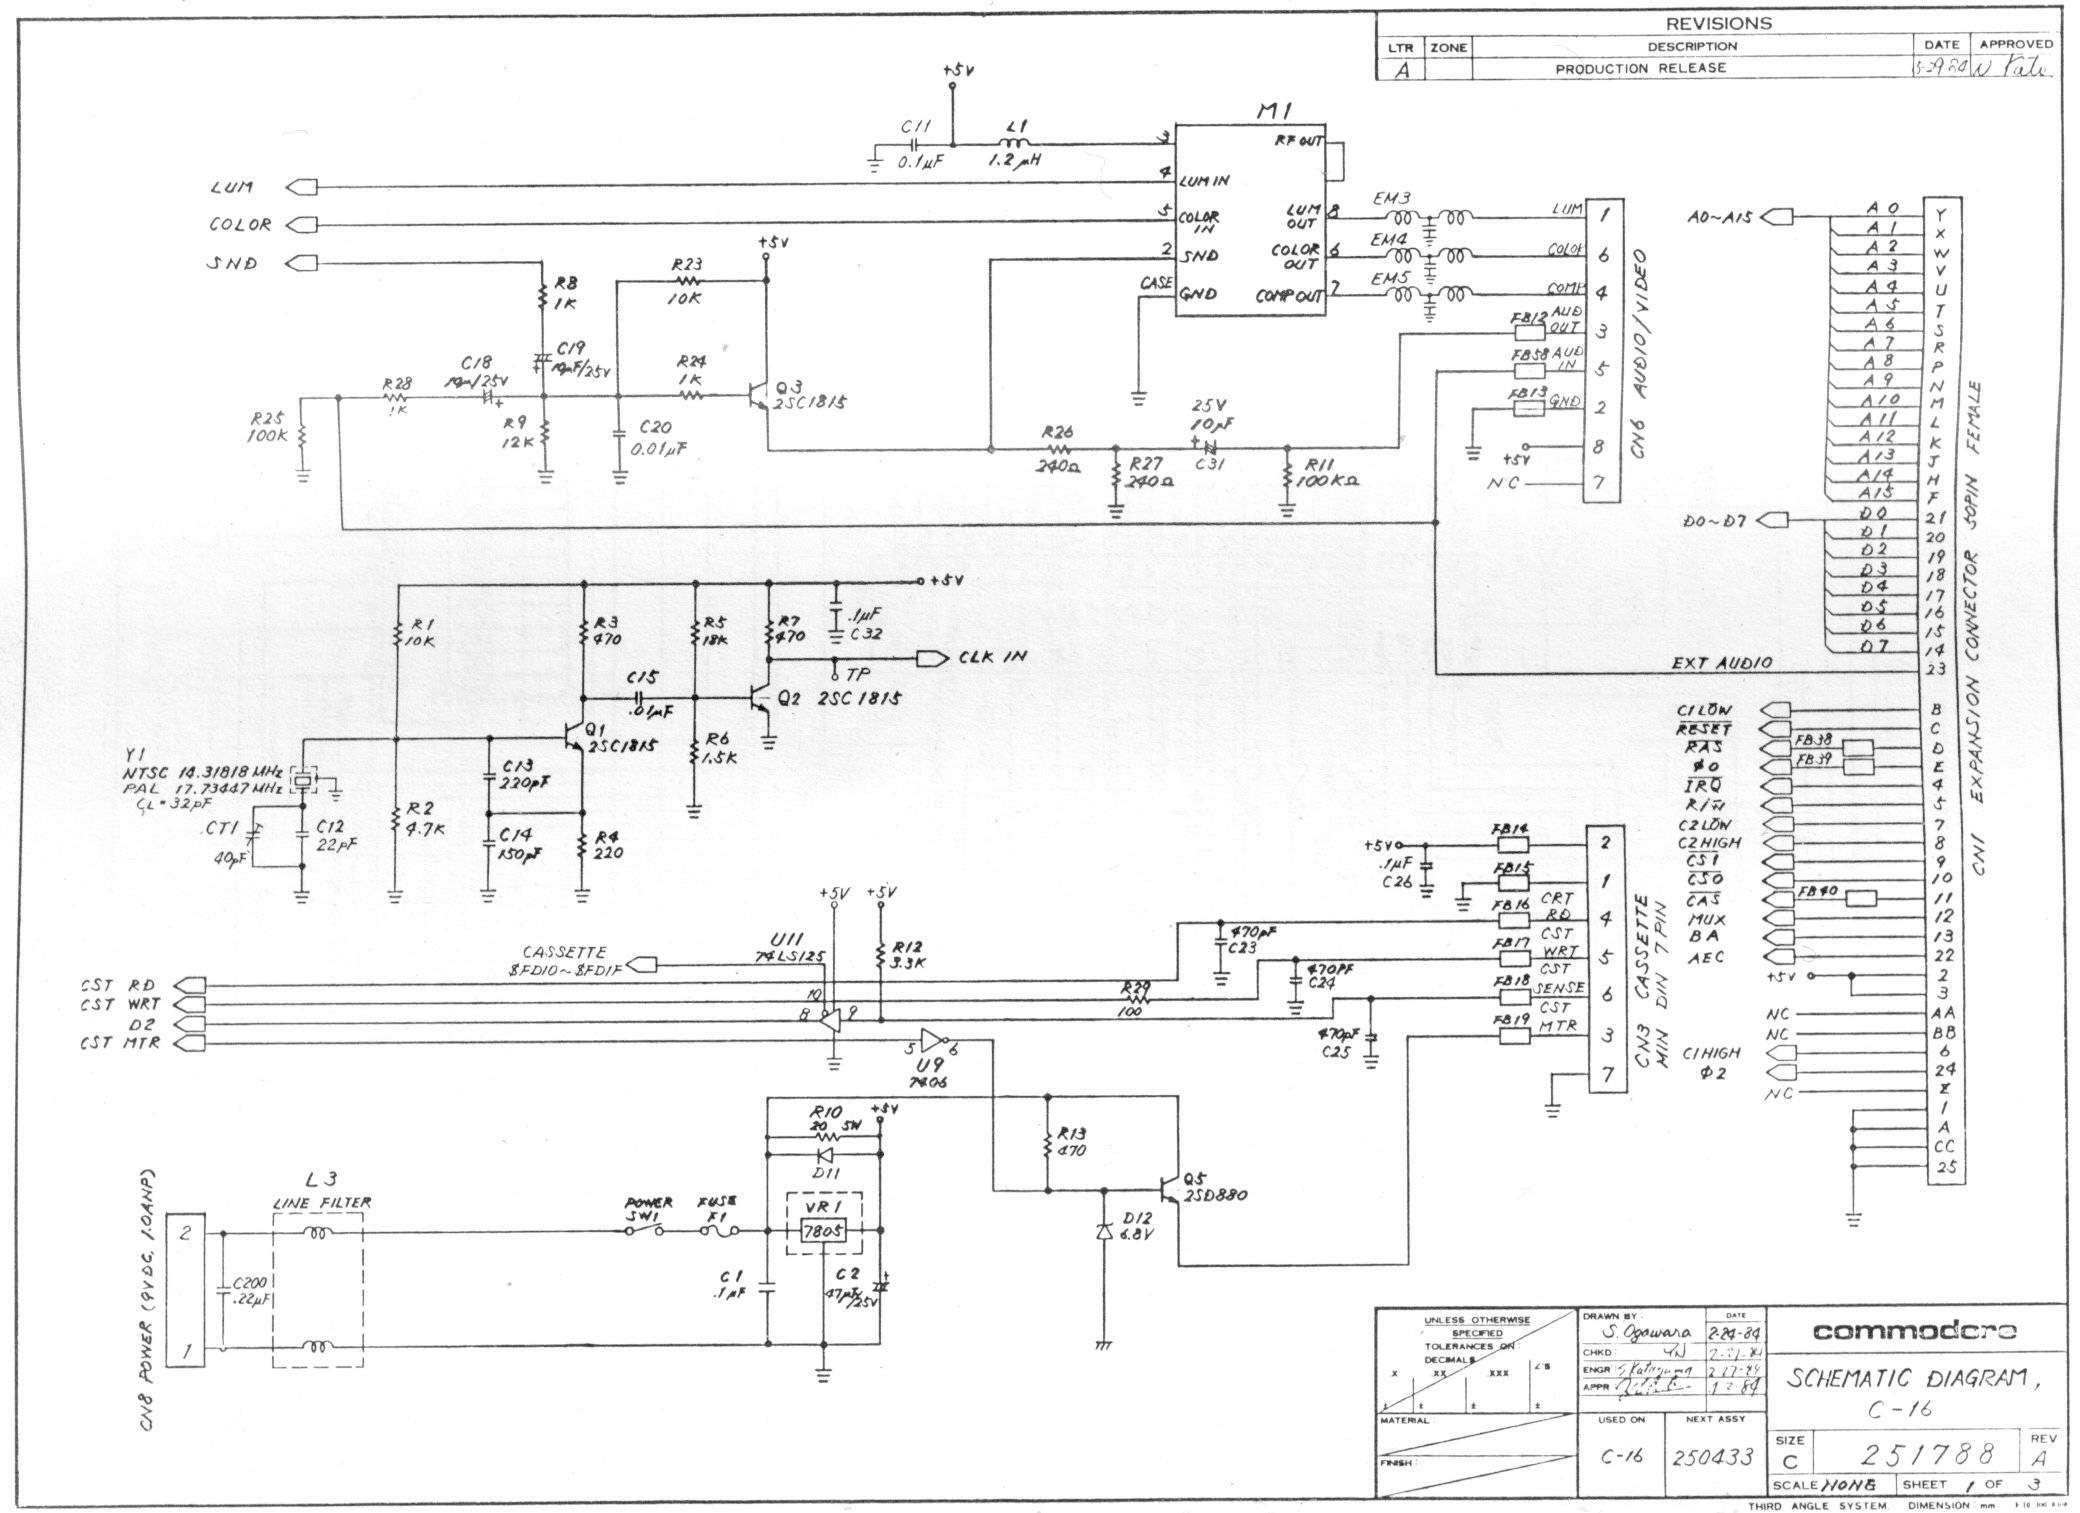 Schemi Elettrici Automobili : Schemi elettrici